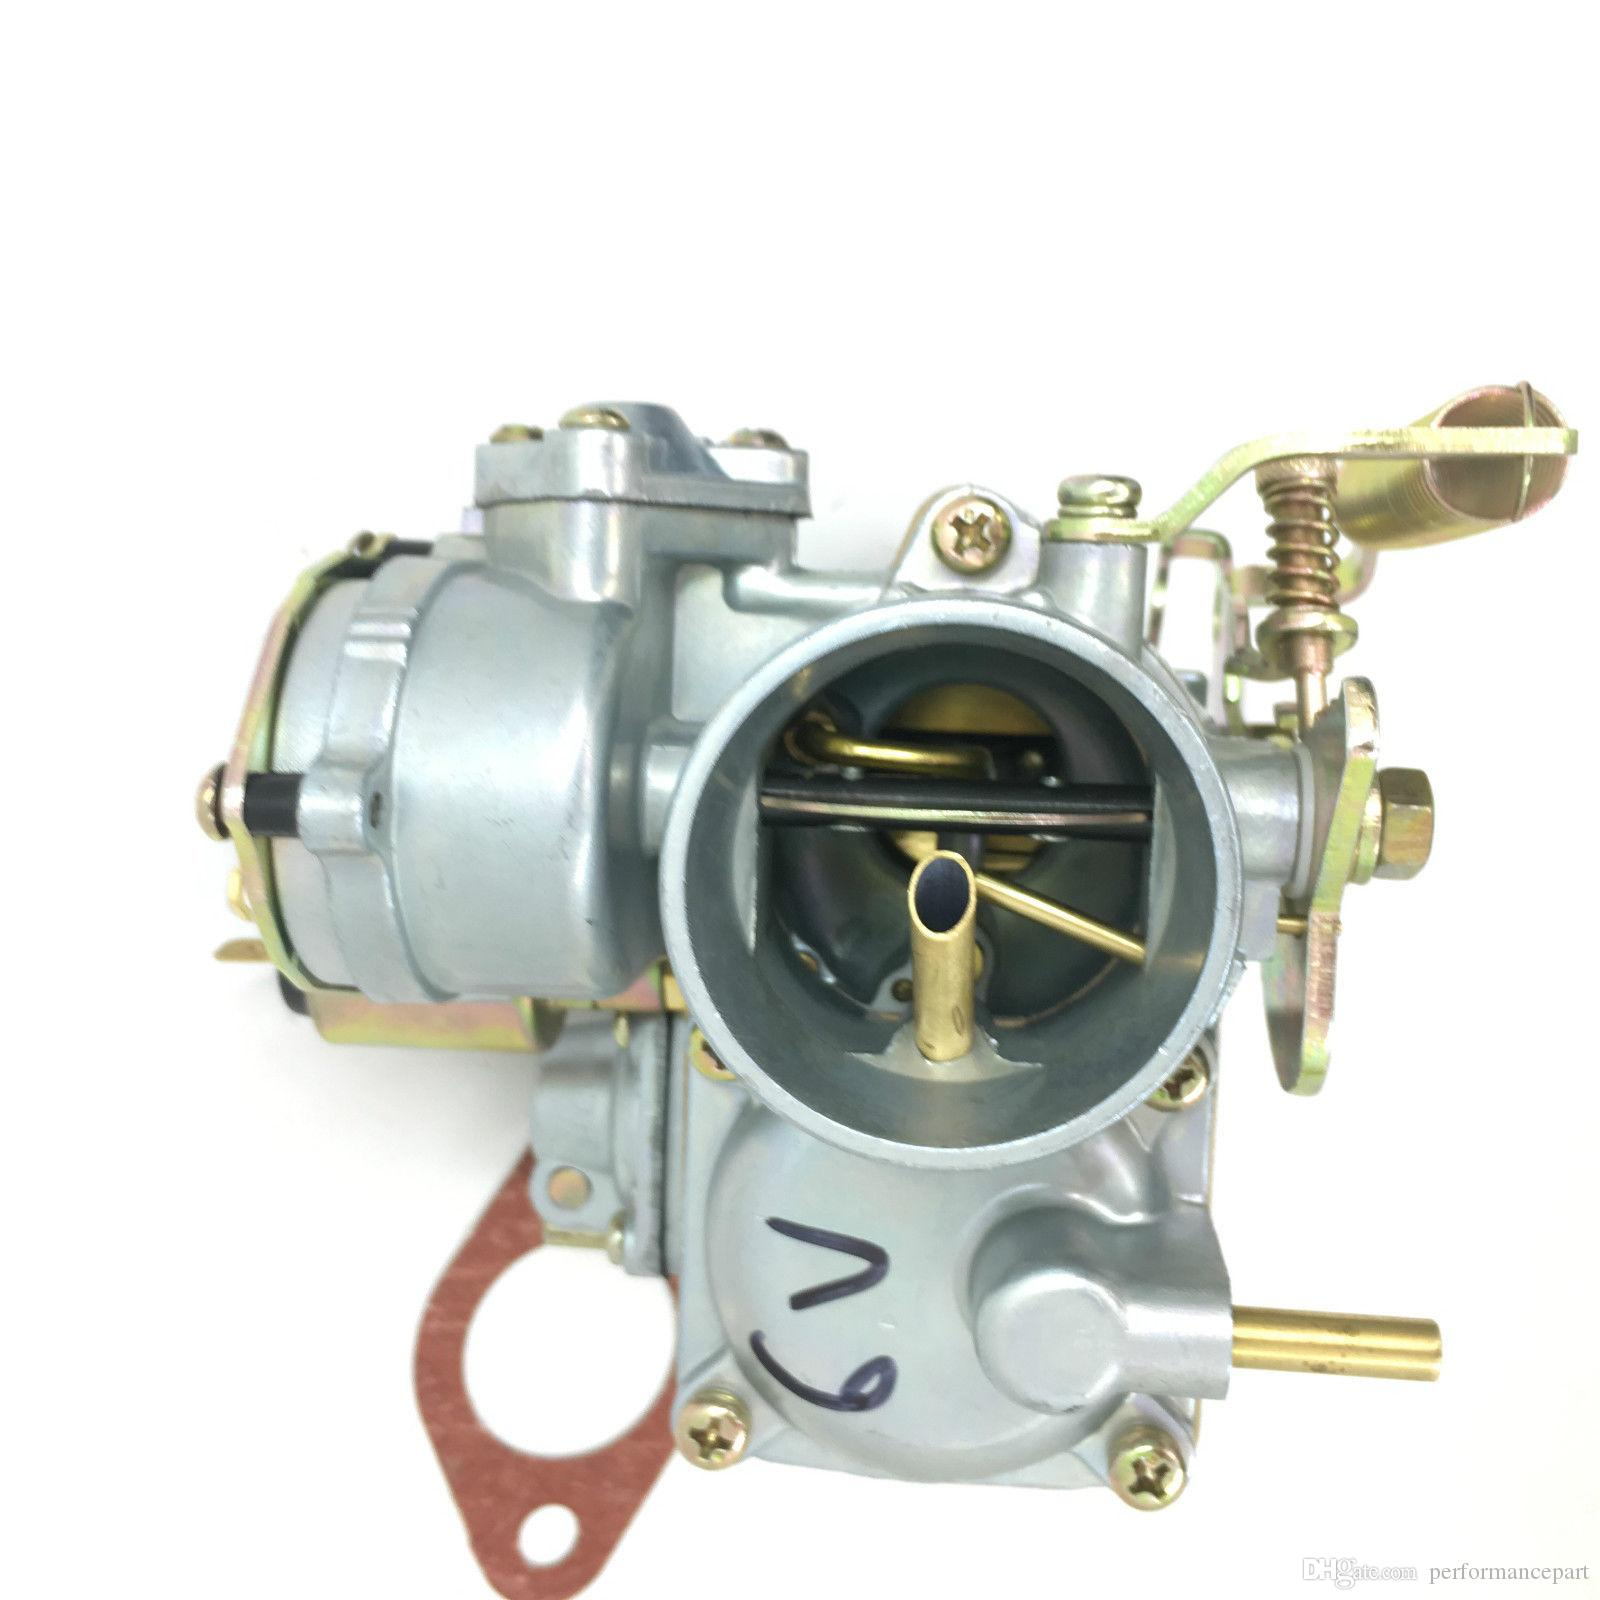 2019 30PICT 1 CARBURETTOR Electric Choke Fit VW Beetle Carburator Bug Solex  EMPI 6V From Performancepart, $110 55 | DHgate Com